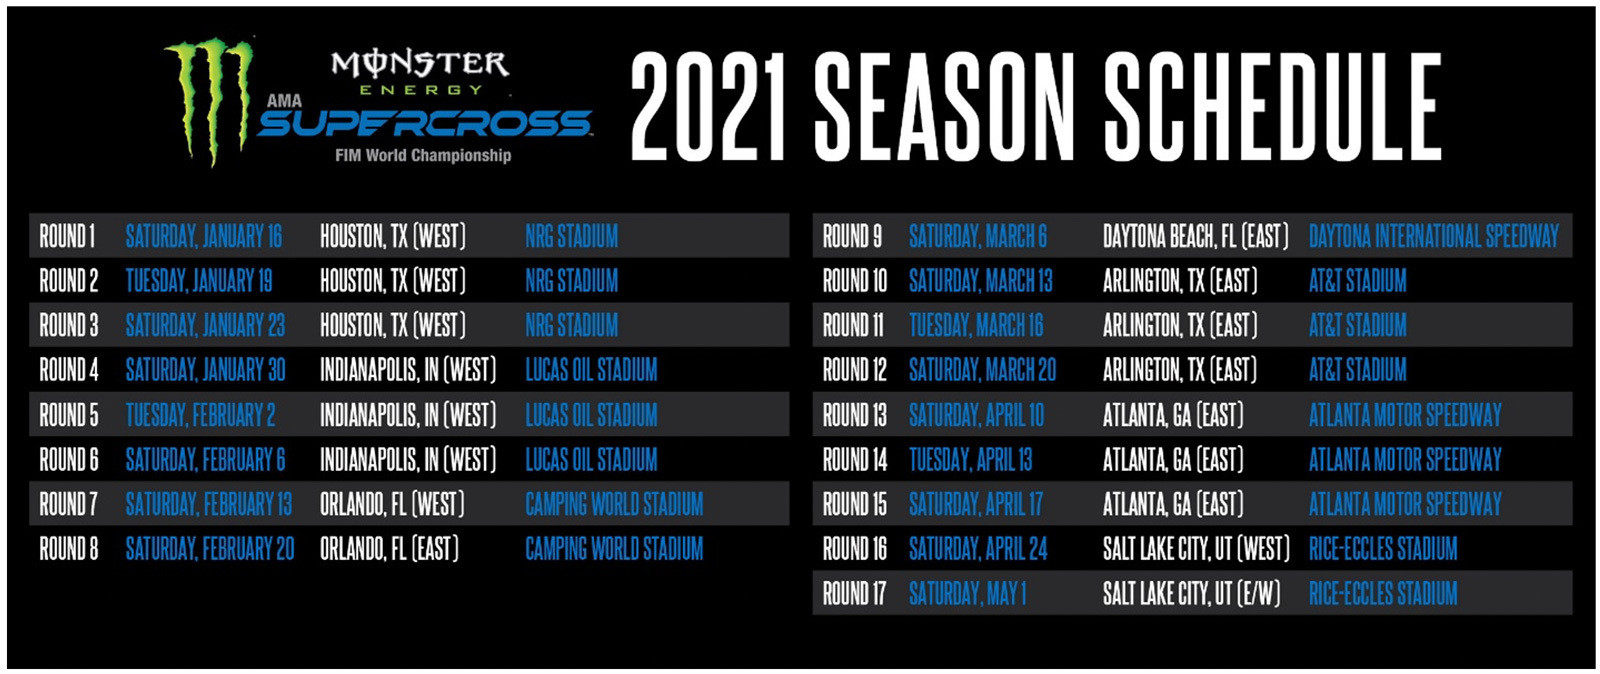 Complete 2021 Monster Energy Supercross Schedule.